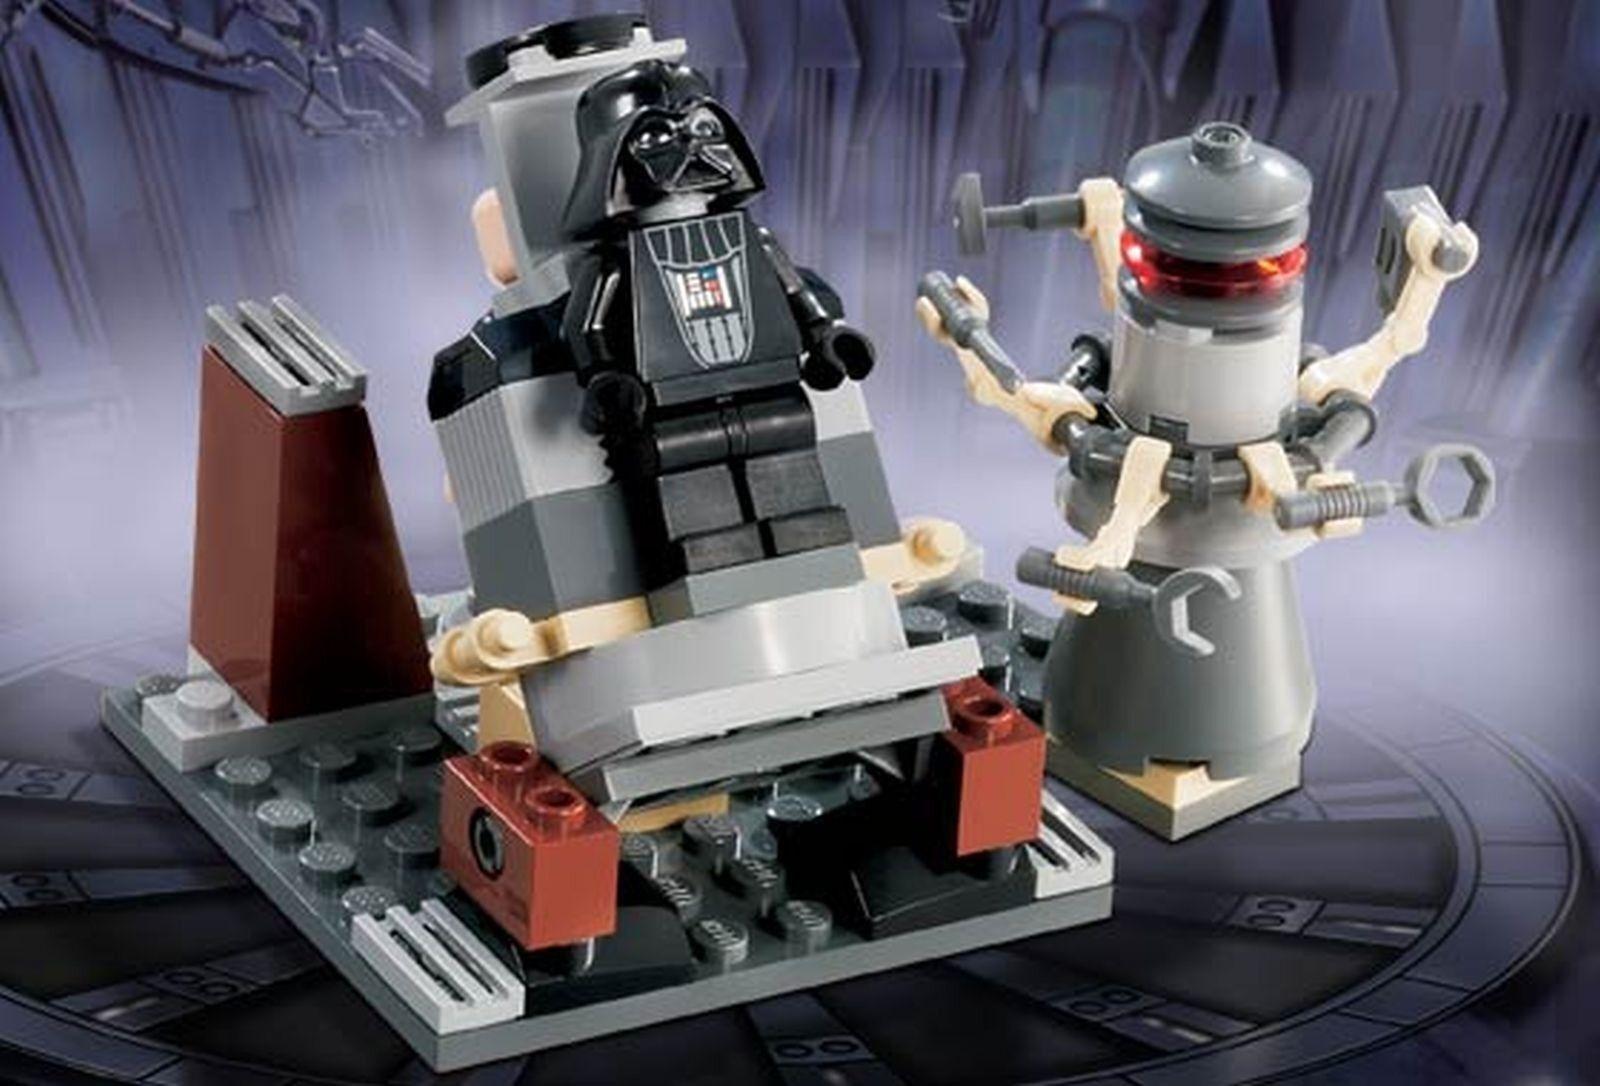 LEGO 7251 Darth Vader Transformation includes 3 Minifigures Complete